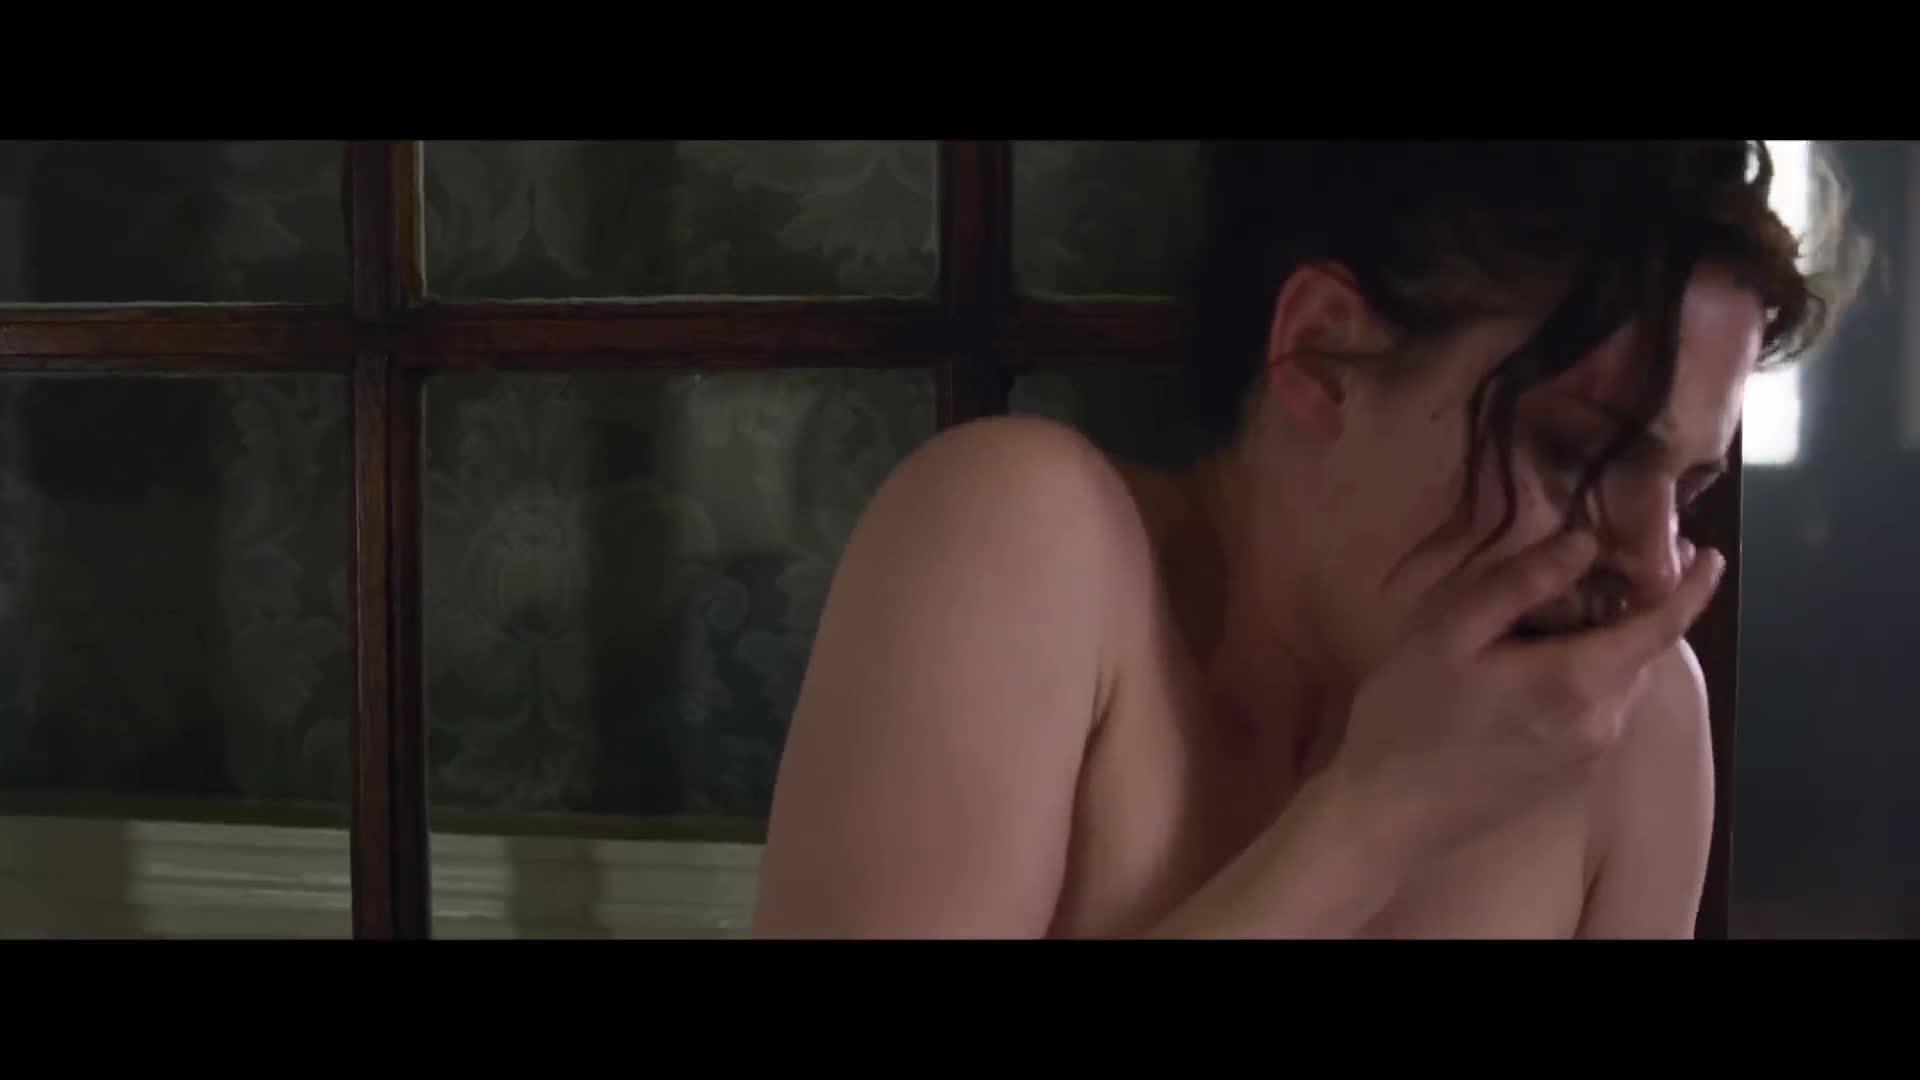 Trailer Kristen Stewart hóa nàng hầu yêu cô chủ trong Lizzie